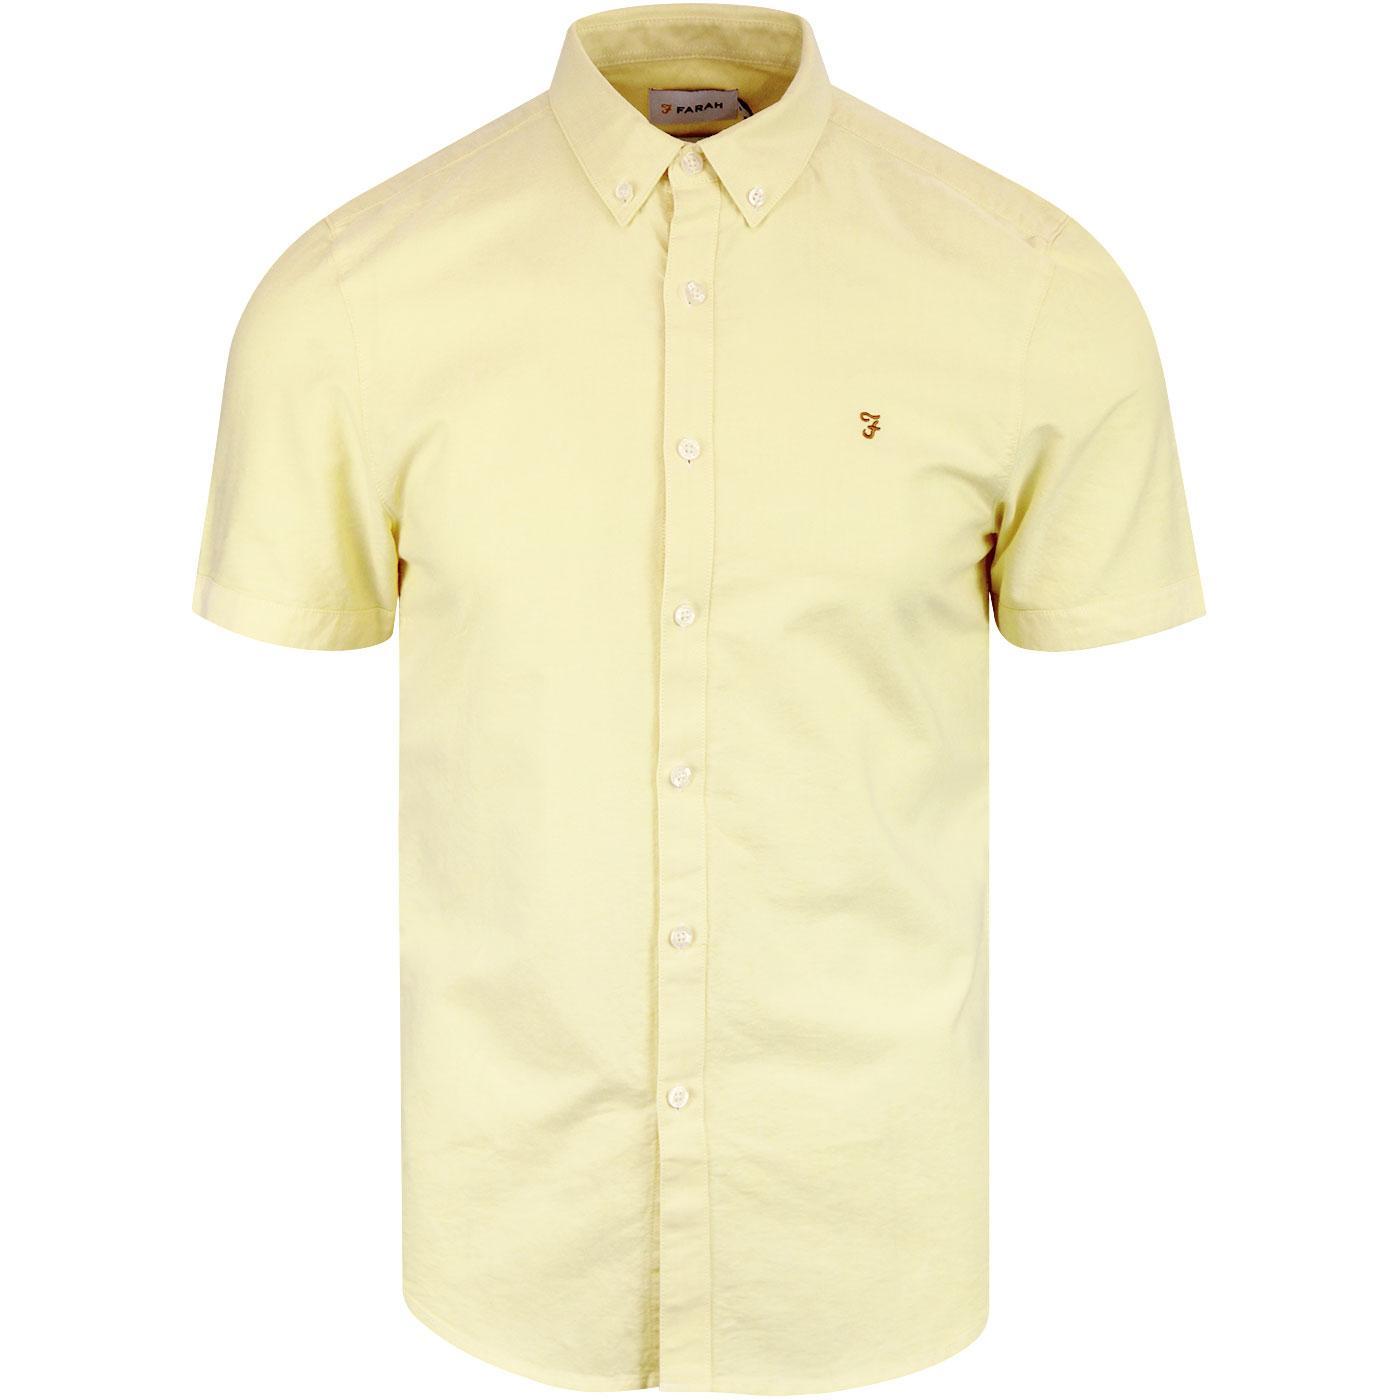 Brewer FARAH Slim Mod S/S Oxford Shirt ACID YELLOW